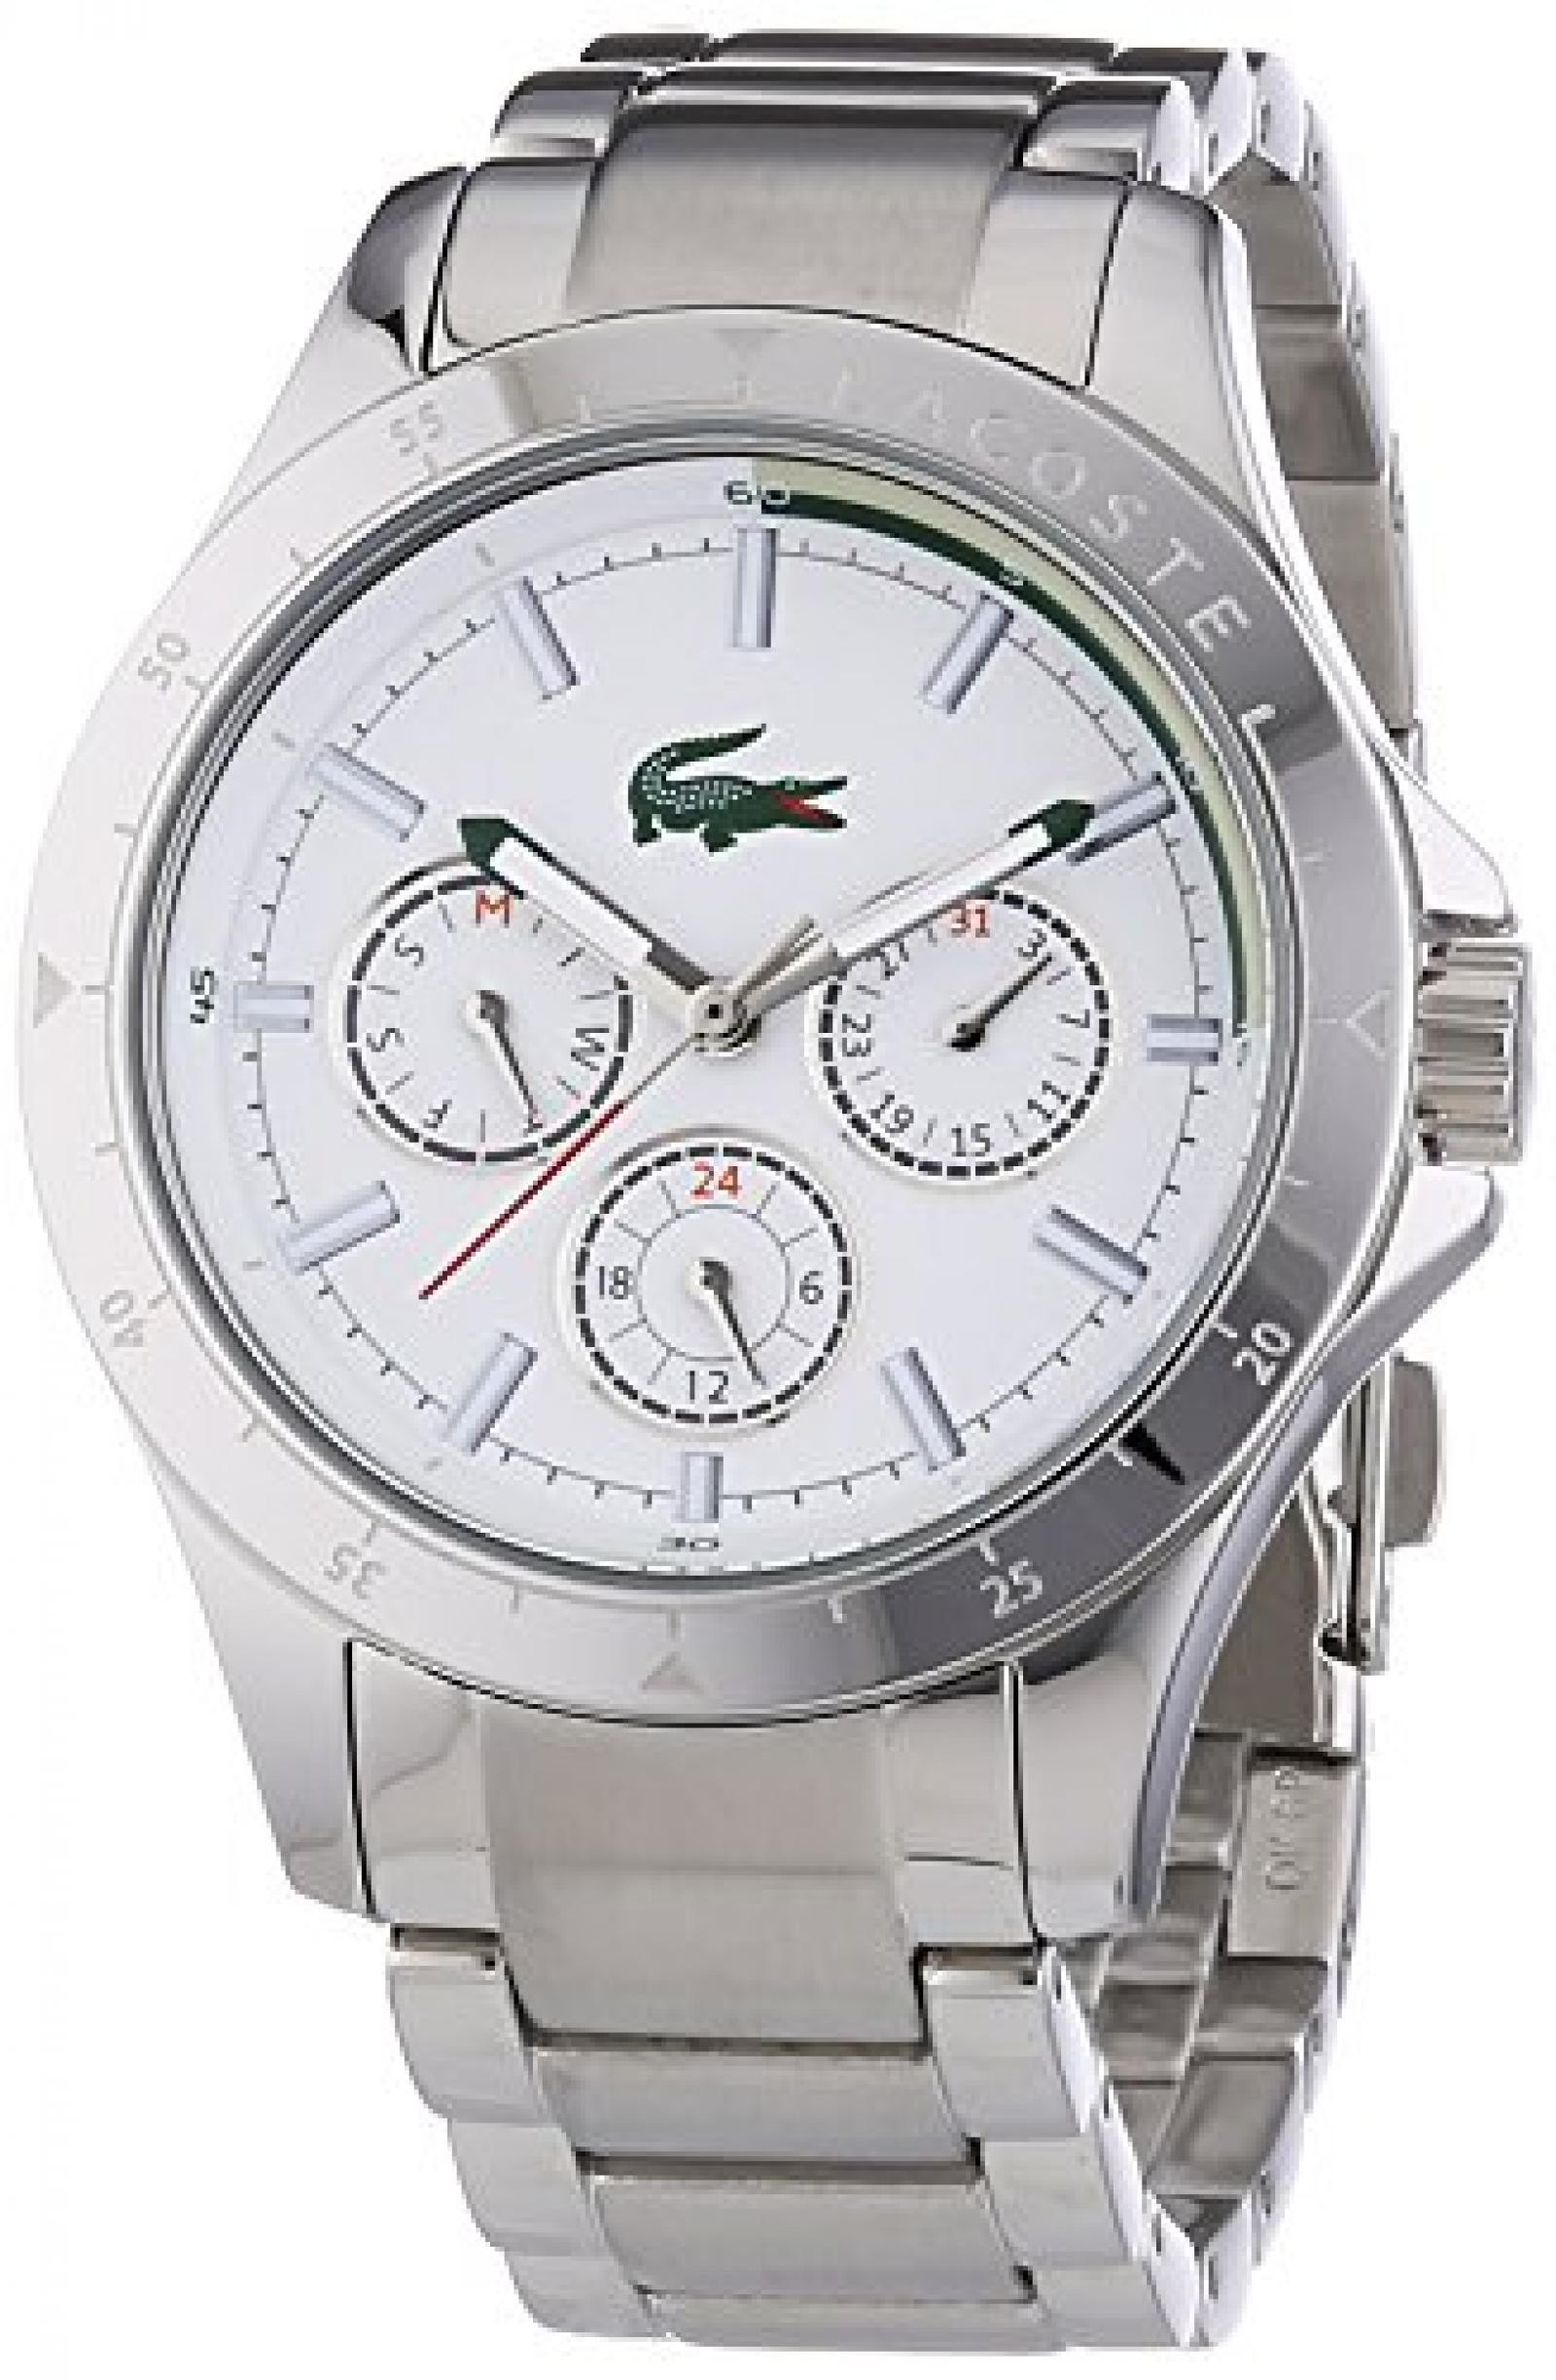 Lacoste Damen-Armbanduhr MACKAY Analog Quarz Edelstahl 2000840